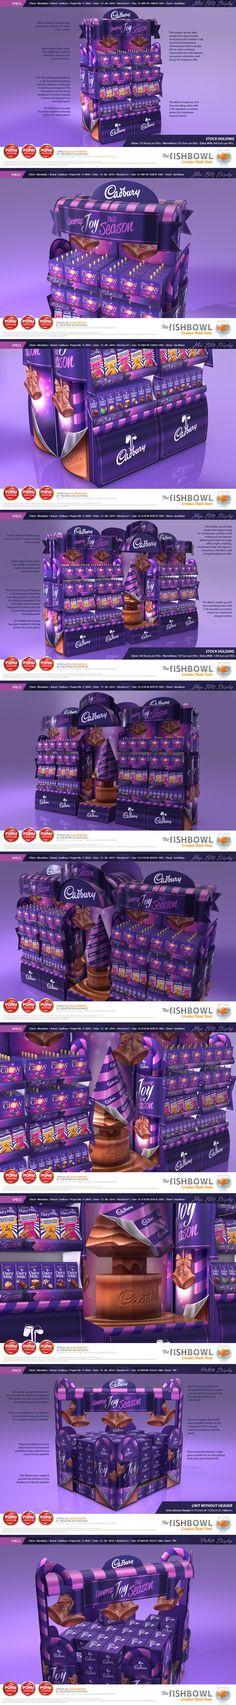 Unwrap Joy - Cadburys Christmas on Behance